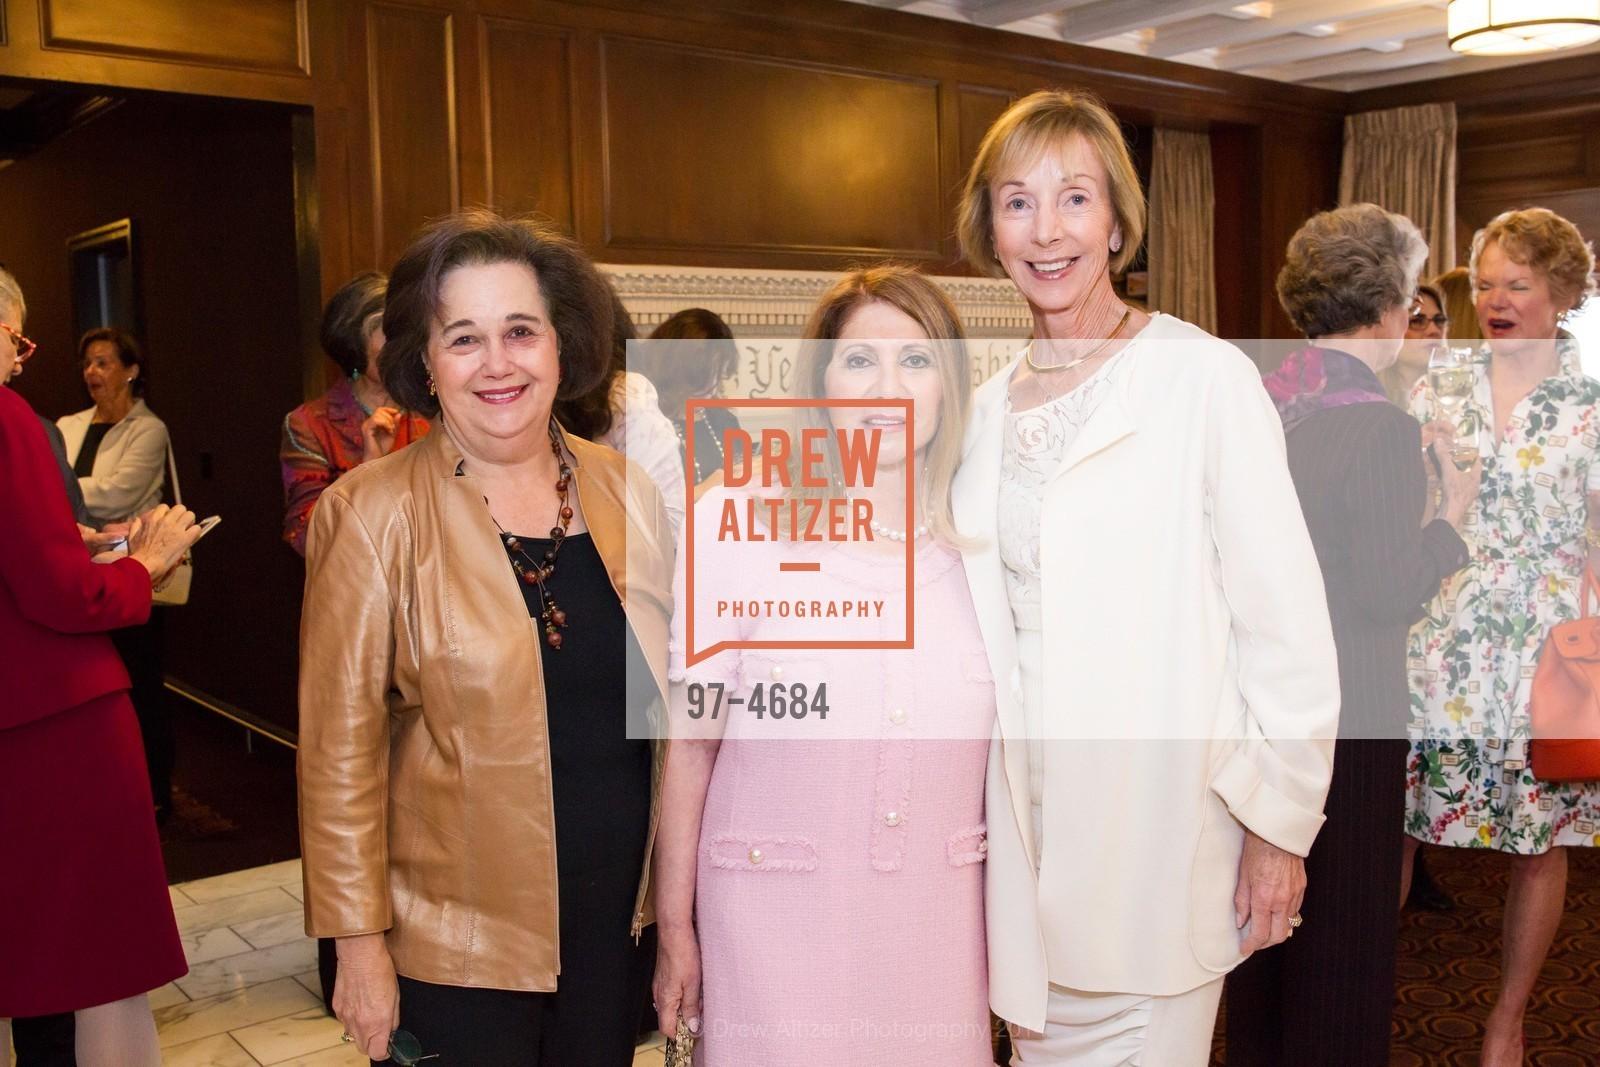 Linda DePlant, Athena Blackburn, Maryann Opperman, Photo #97-4684